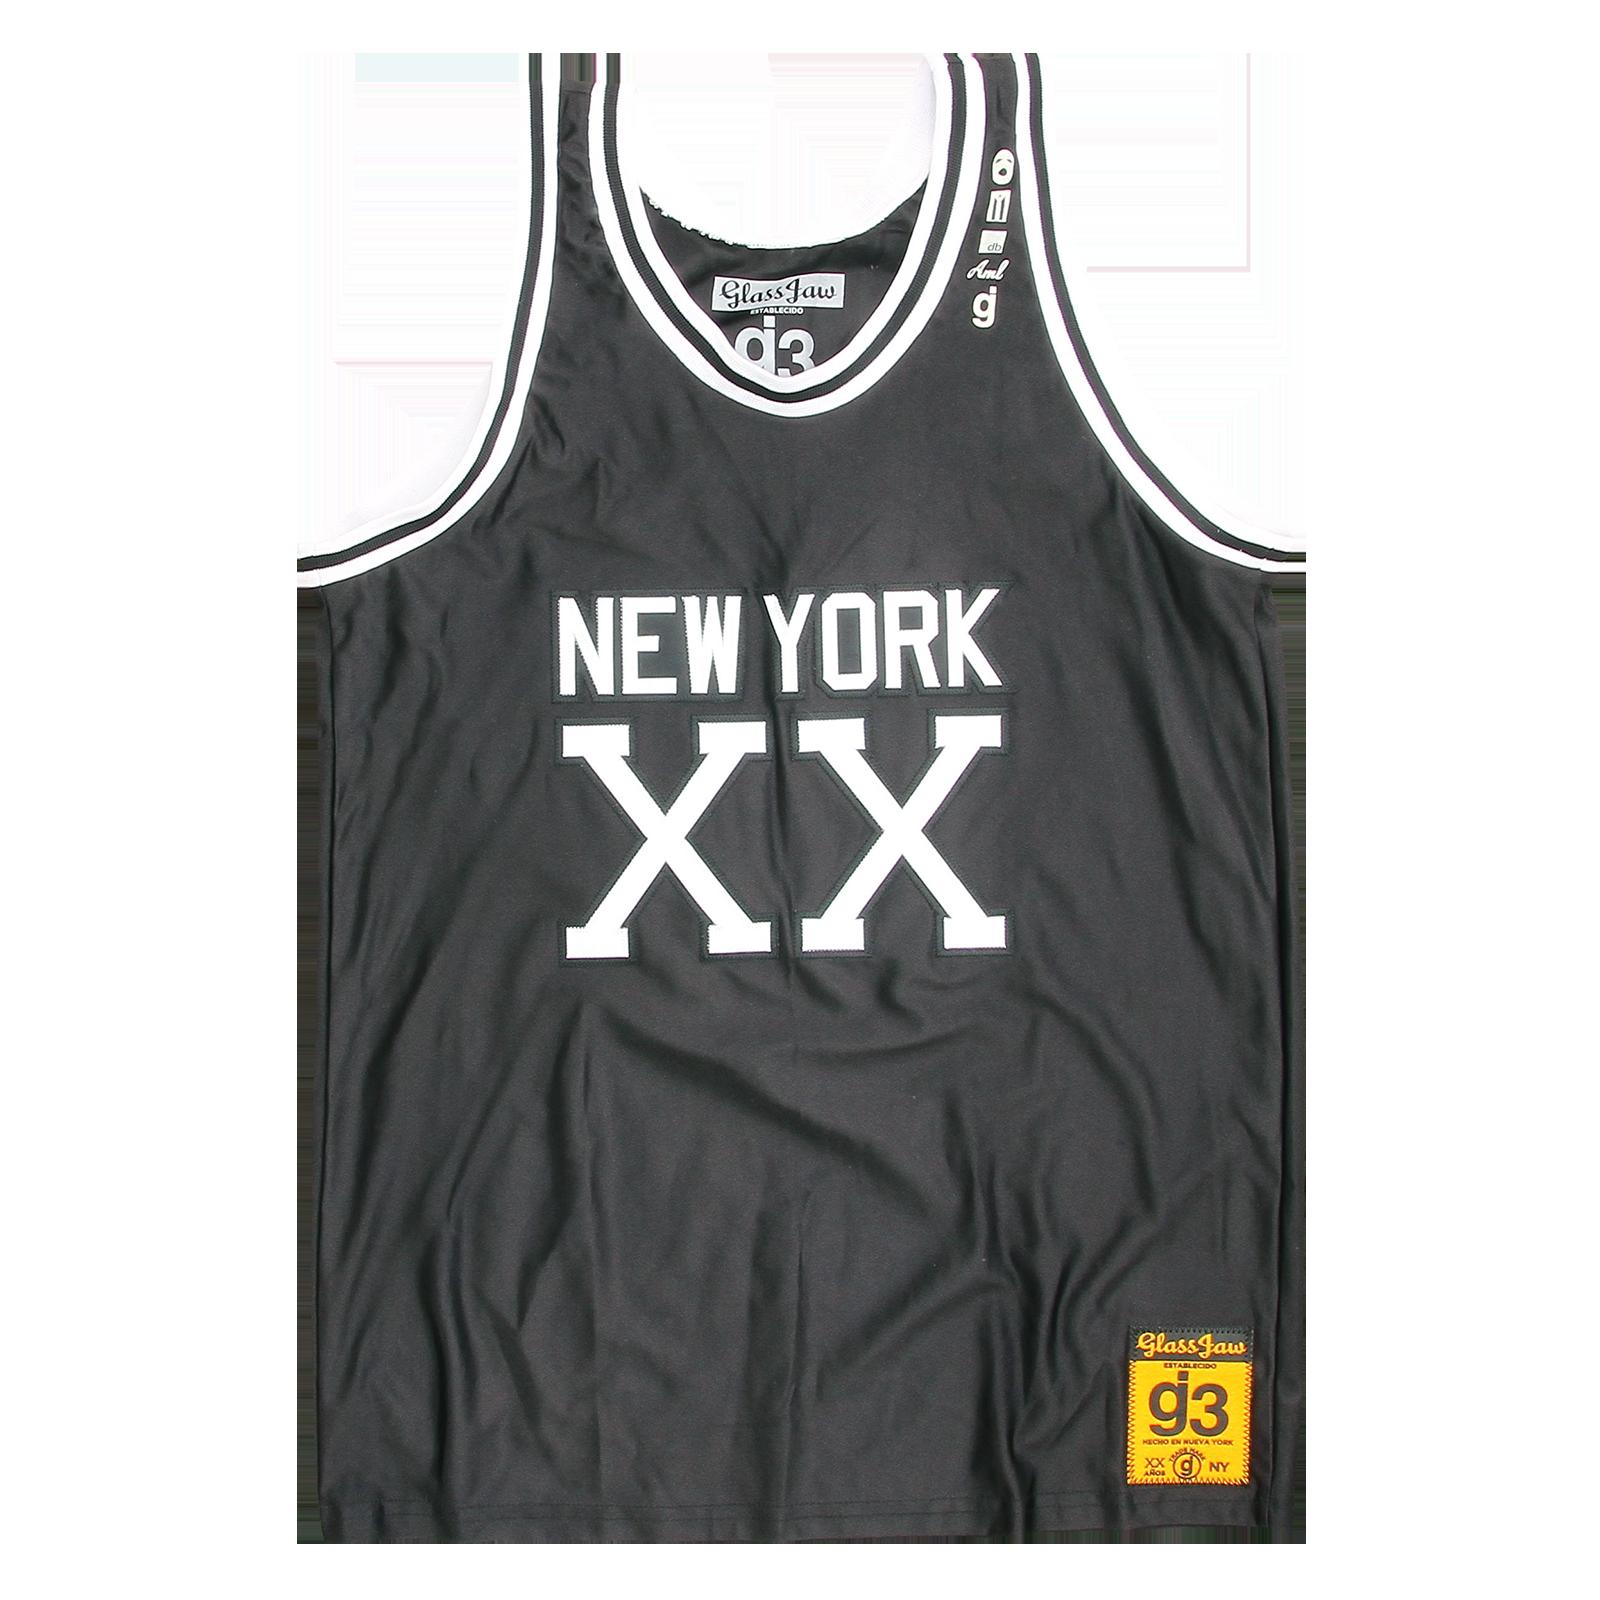 XX Basketball